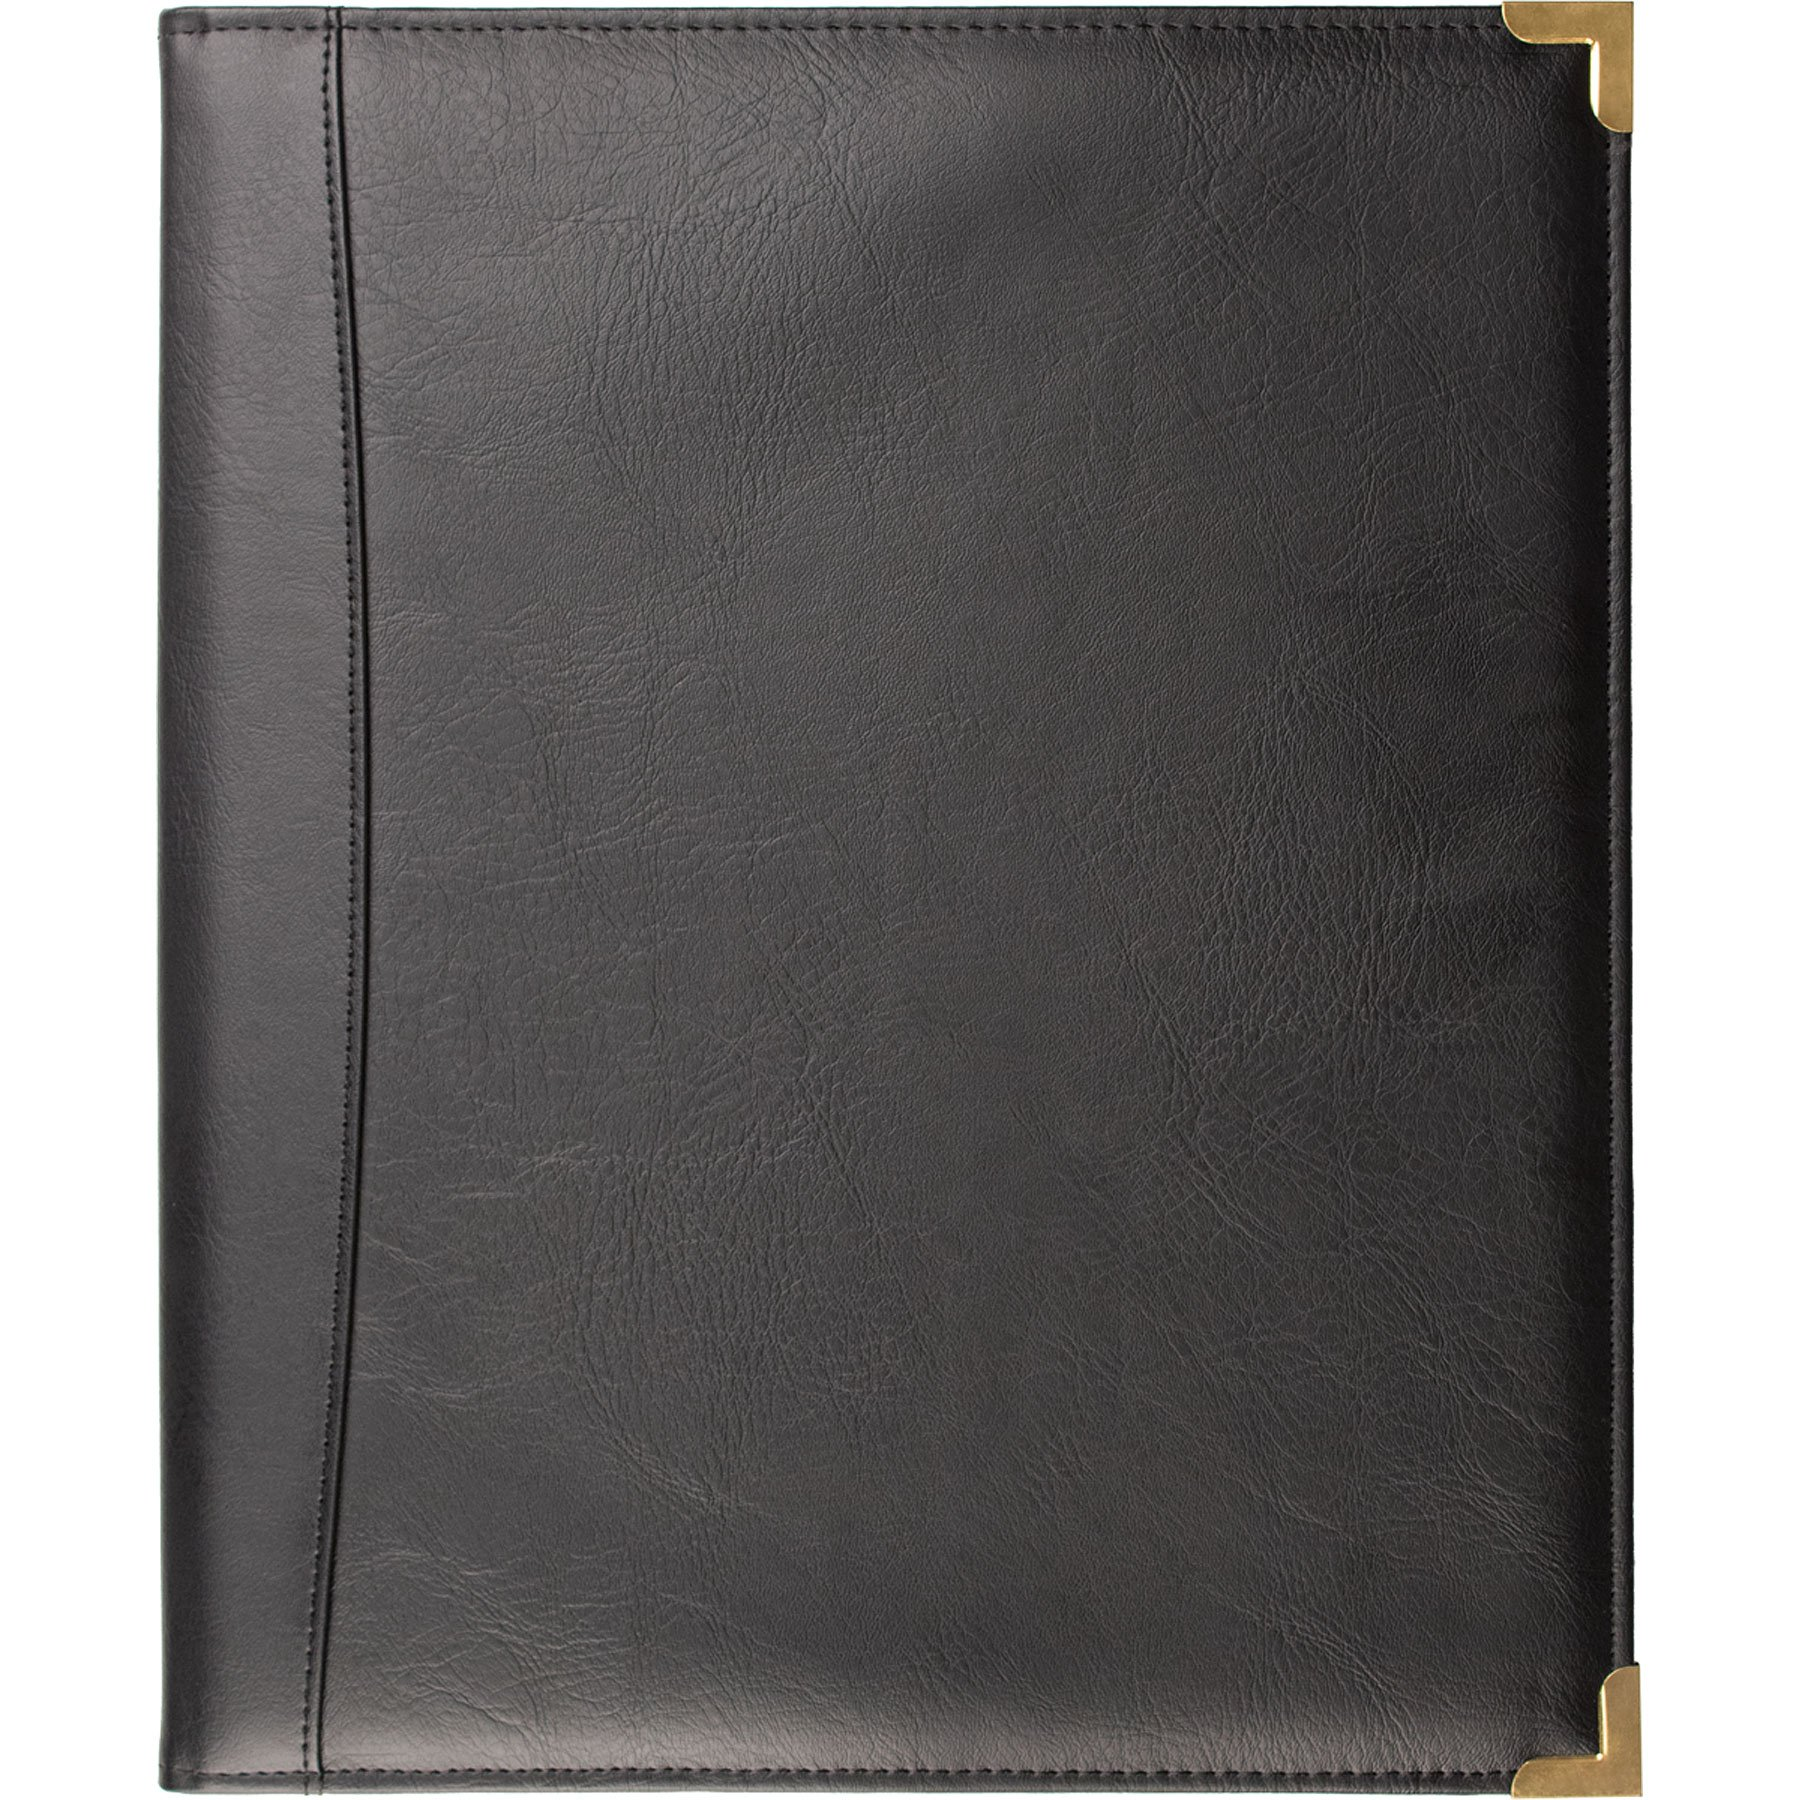 Pro Tec F2BK Deluxe Sheet Music Folder